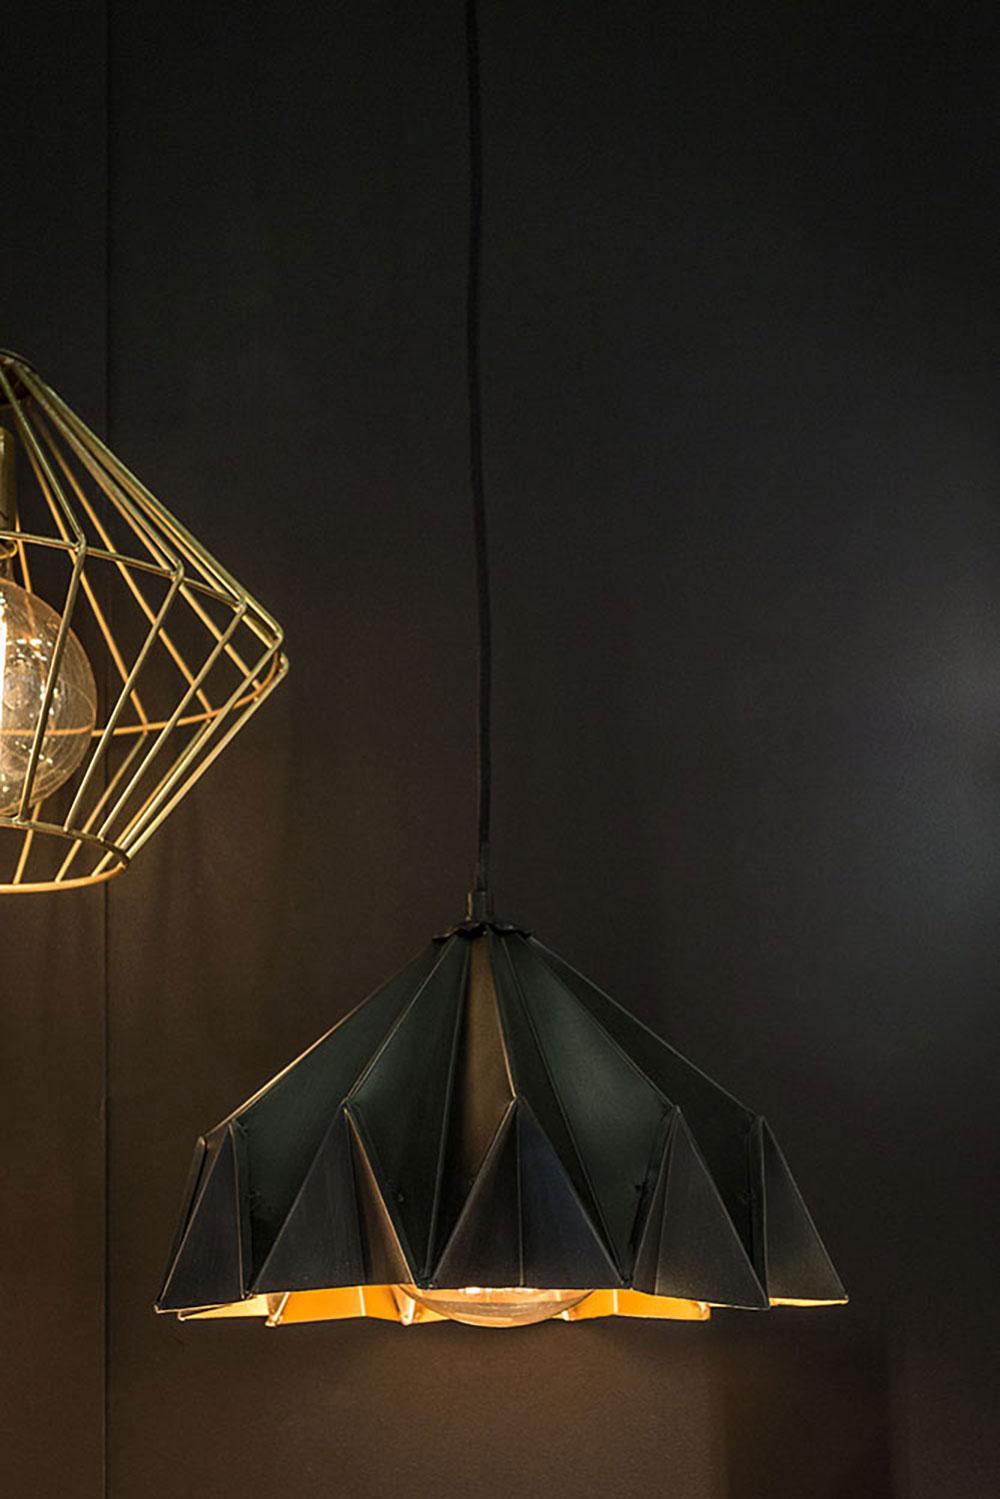 Lampe en suspension par Opjet